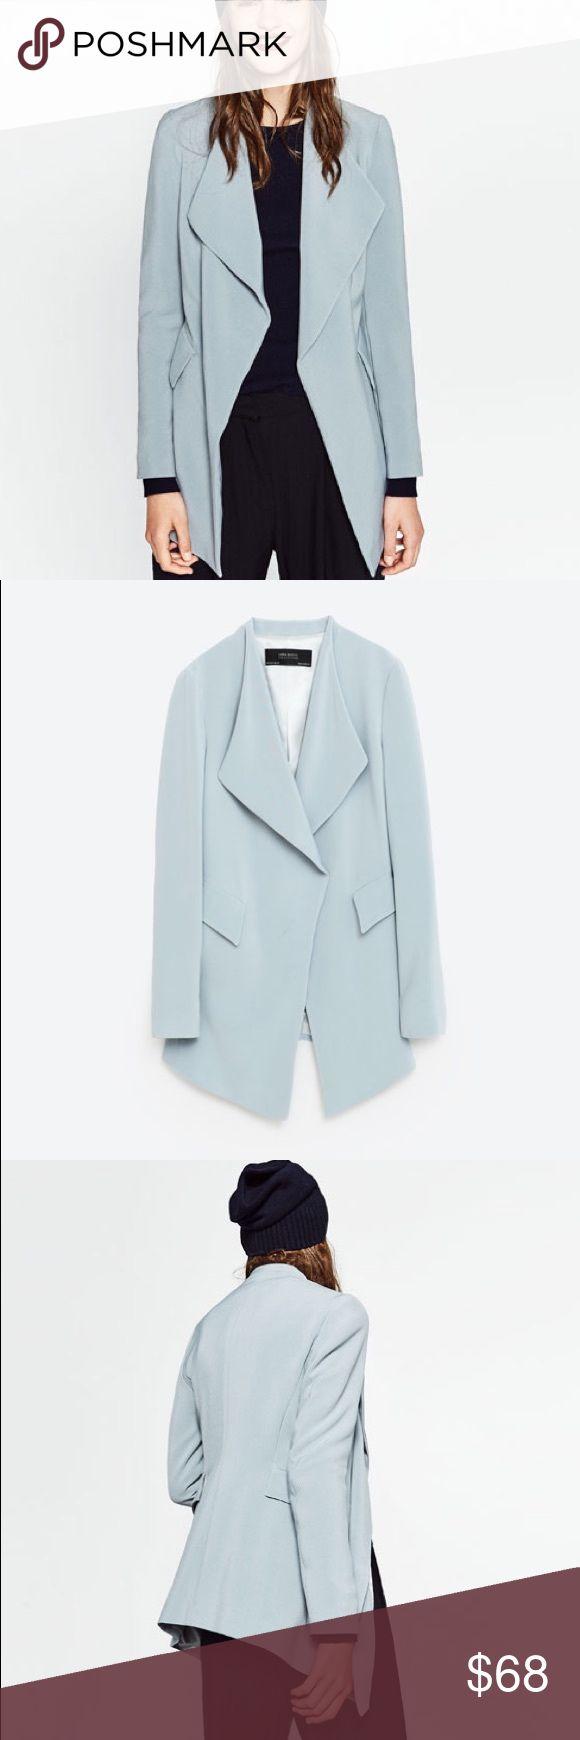 Zara flowing crepe blazer-- small Love blue/ grey color.... relaxed blazer yet polish up any outfit Zara Jackets & Coats Blazers